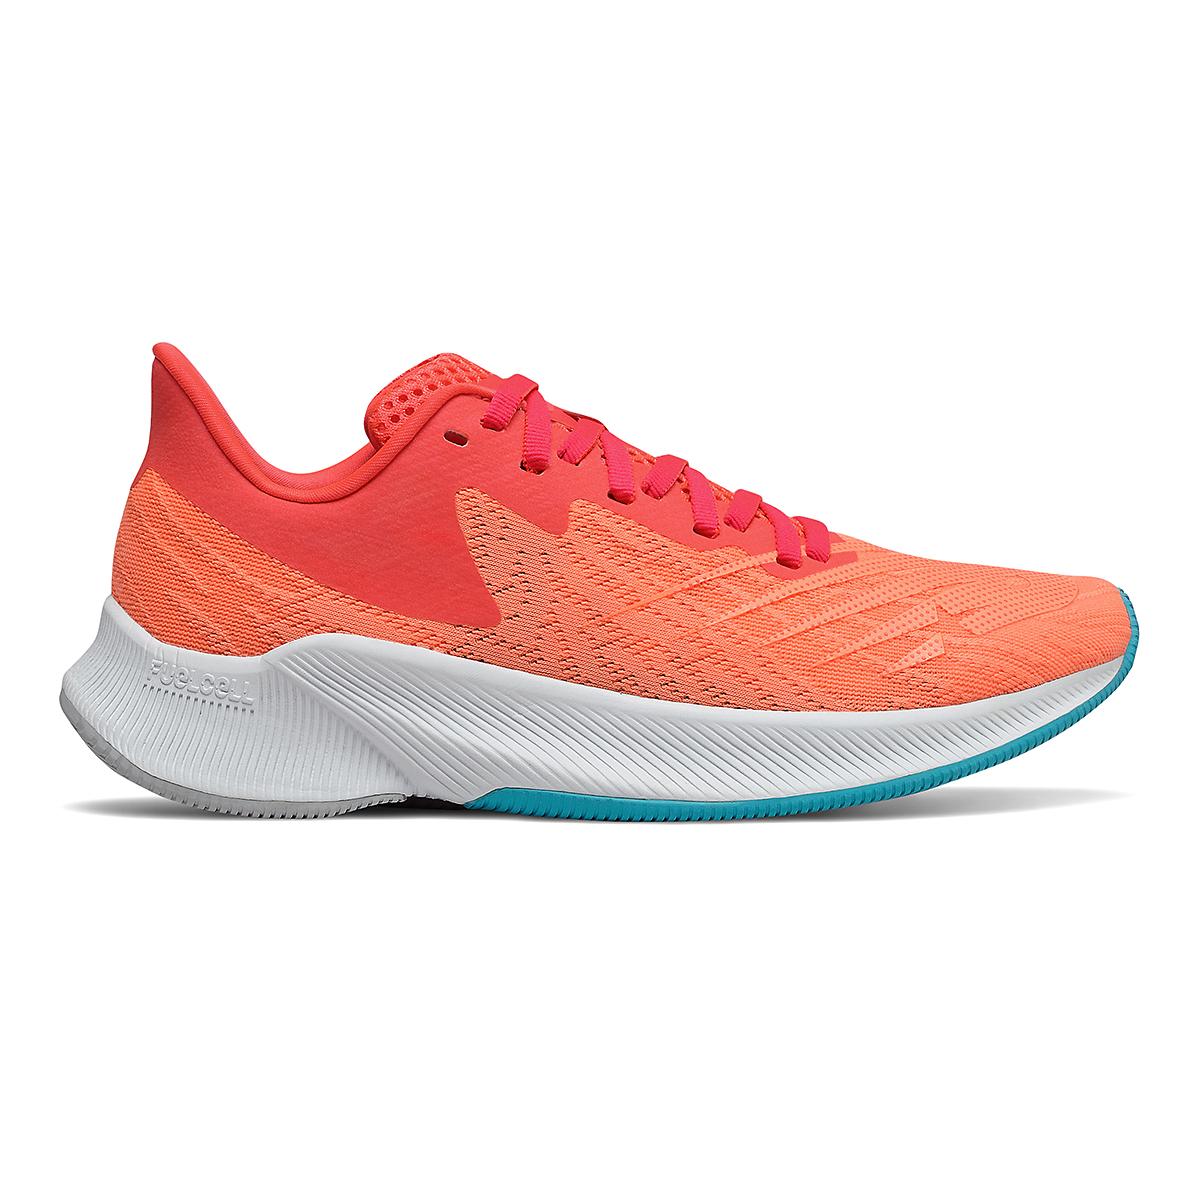 Women's New Balance Fuelcell Prism Running Shoe - Color: Vivid Coral/Citrus - Size: 5 - Width: Regular, Vivid Coral/Citrus, large, image 1